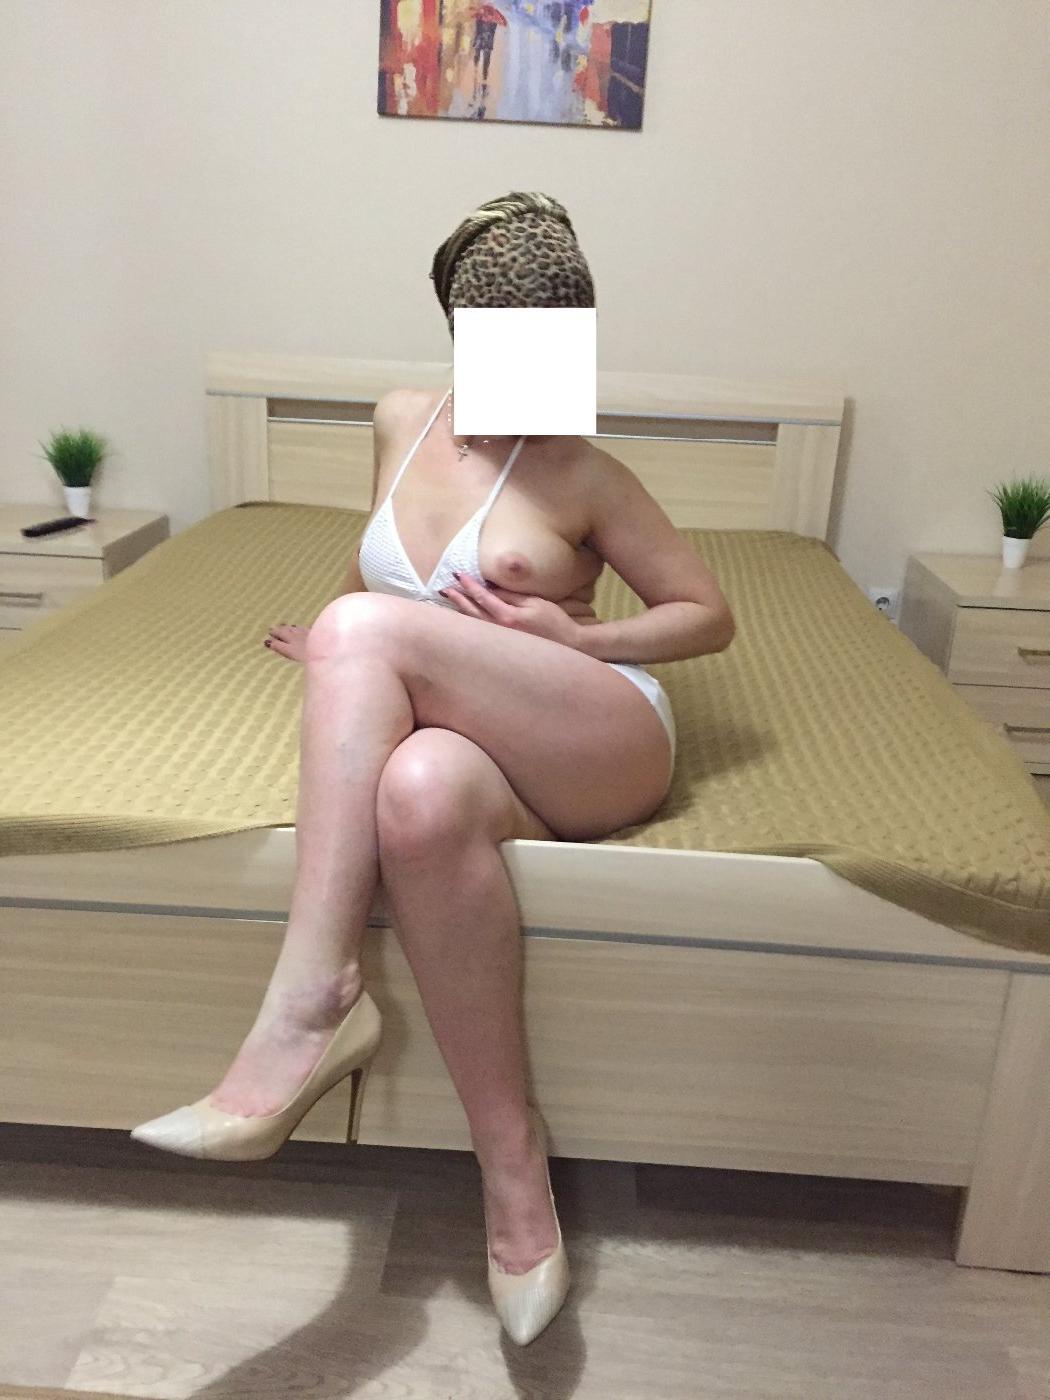 Индивидуалка Лера калинина, 23 года, метро Третьяковская